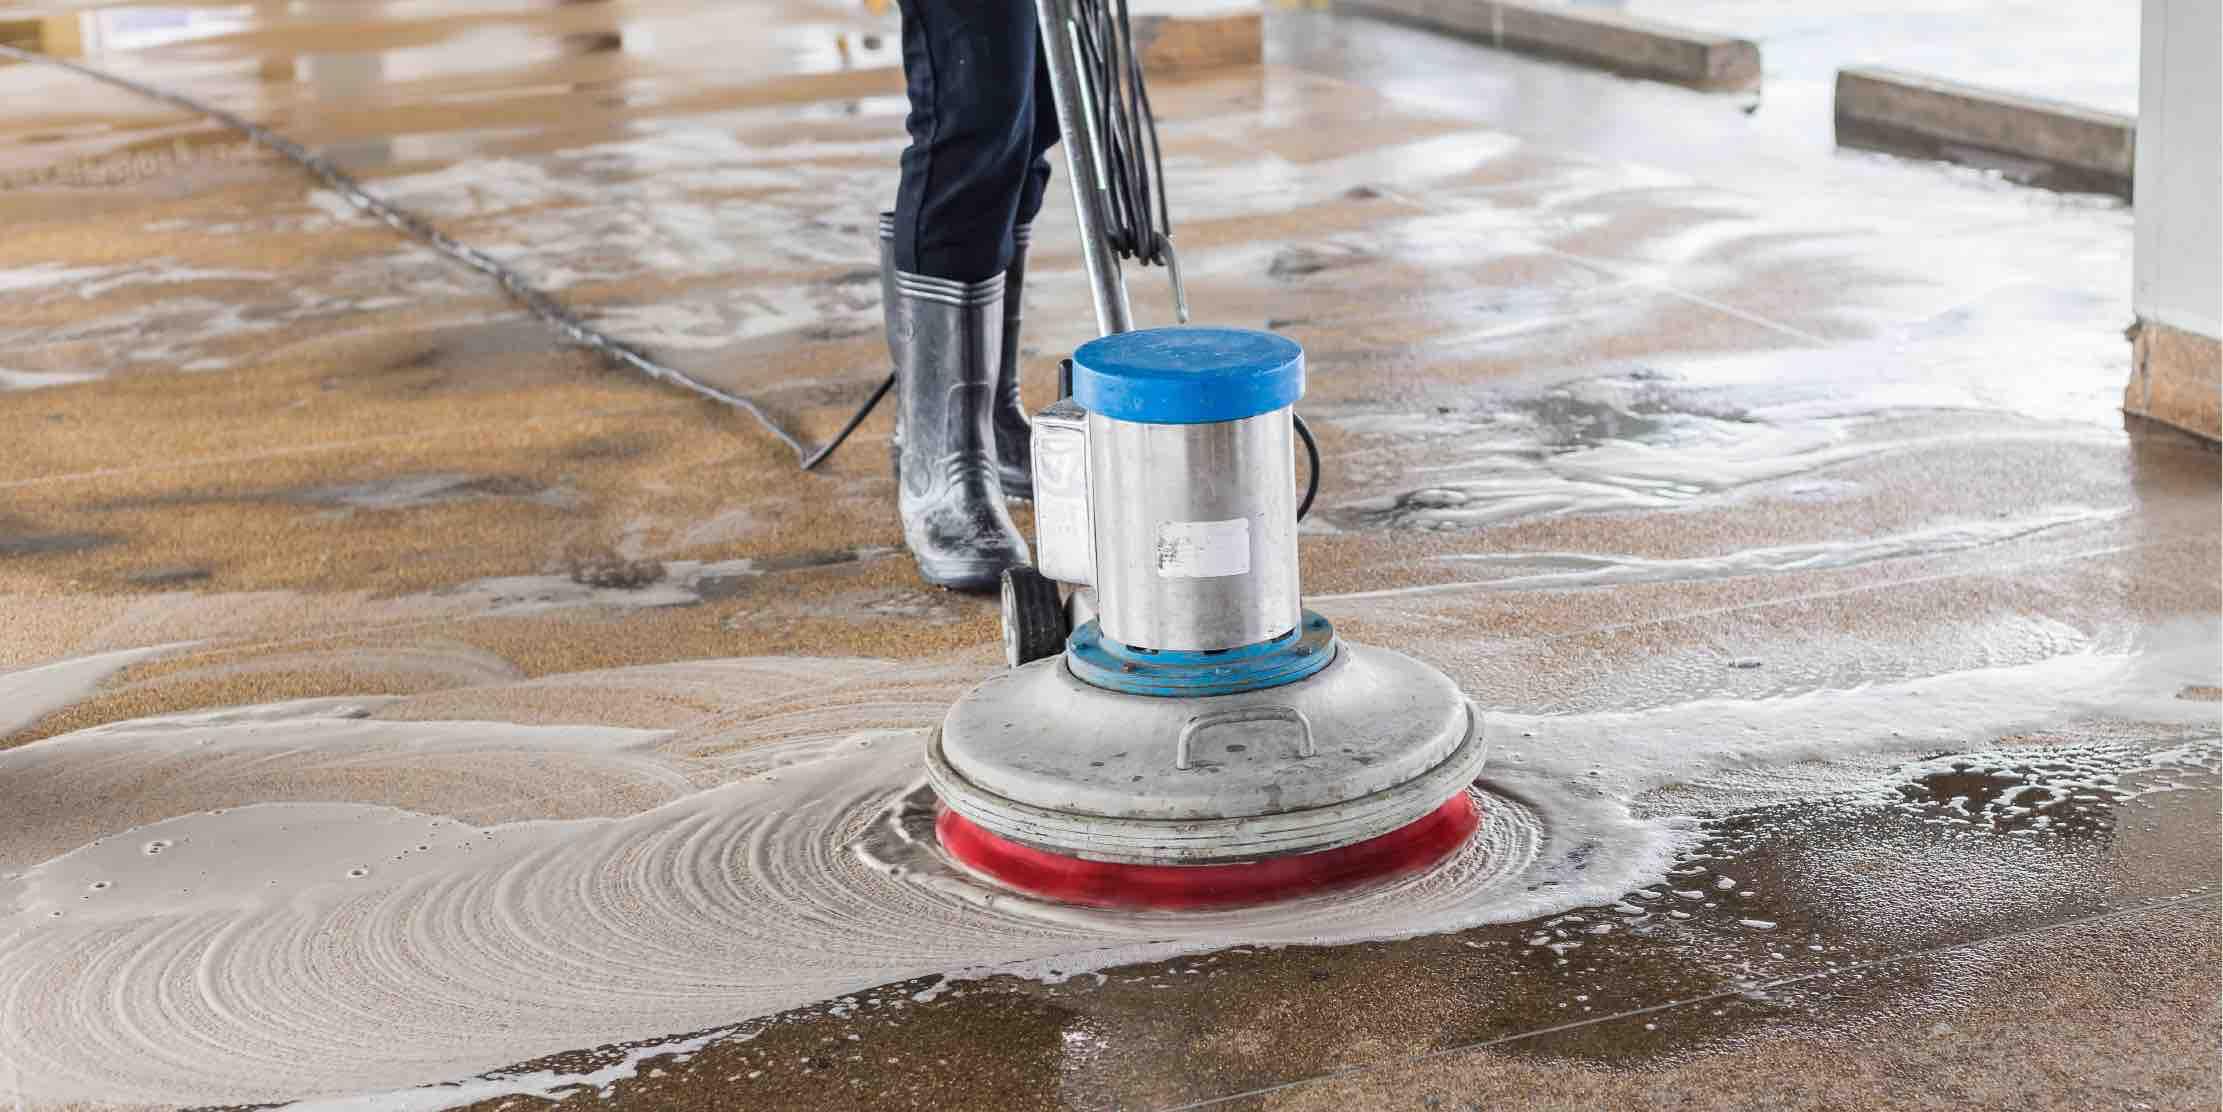 Limpieza con arena proyectada